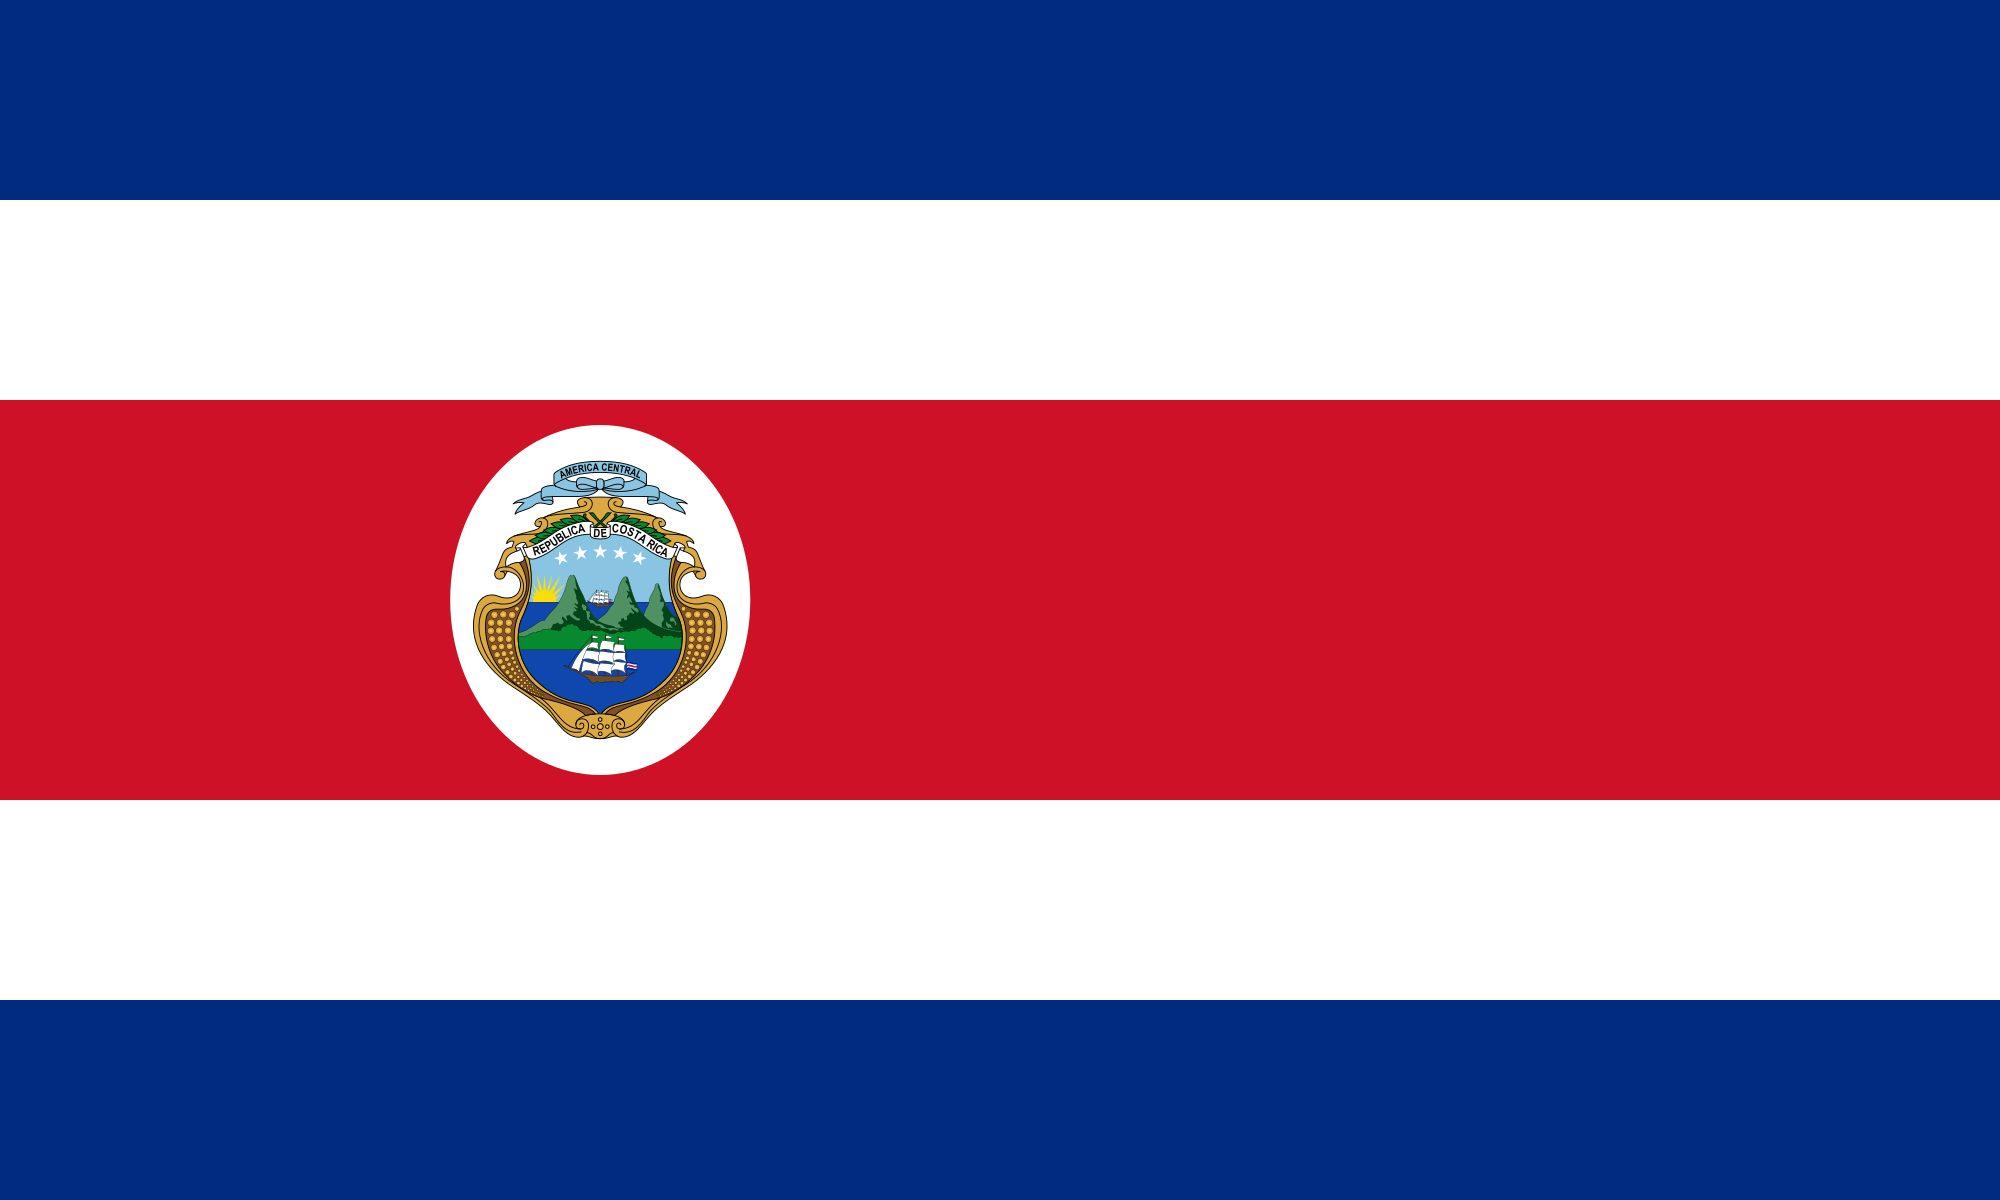 Costa Rica (I) – The Football